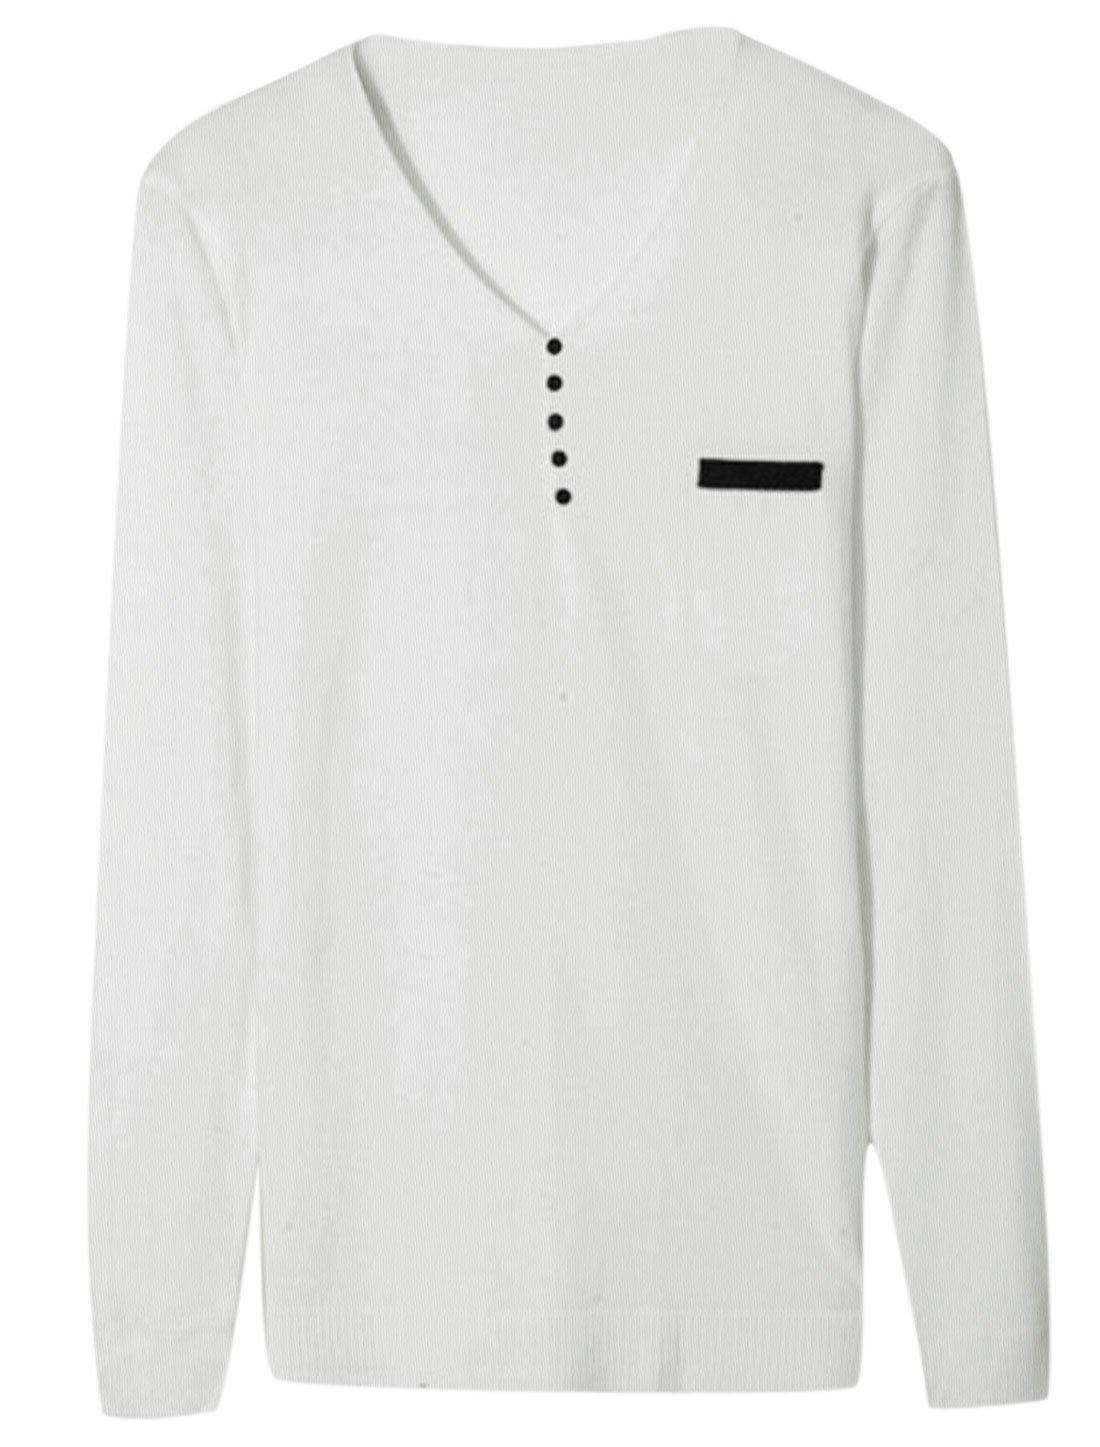 Men V Neck Long Sleeve Buttons Decor Slim Fit Knit Shirt White M